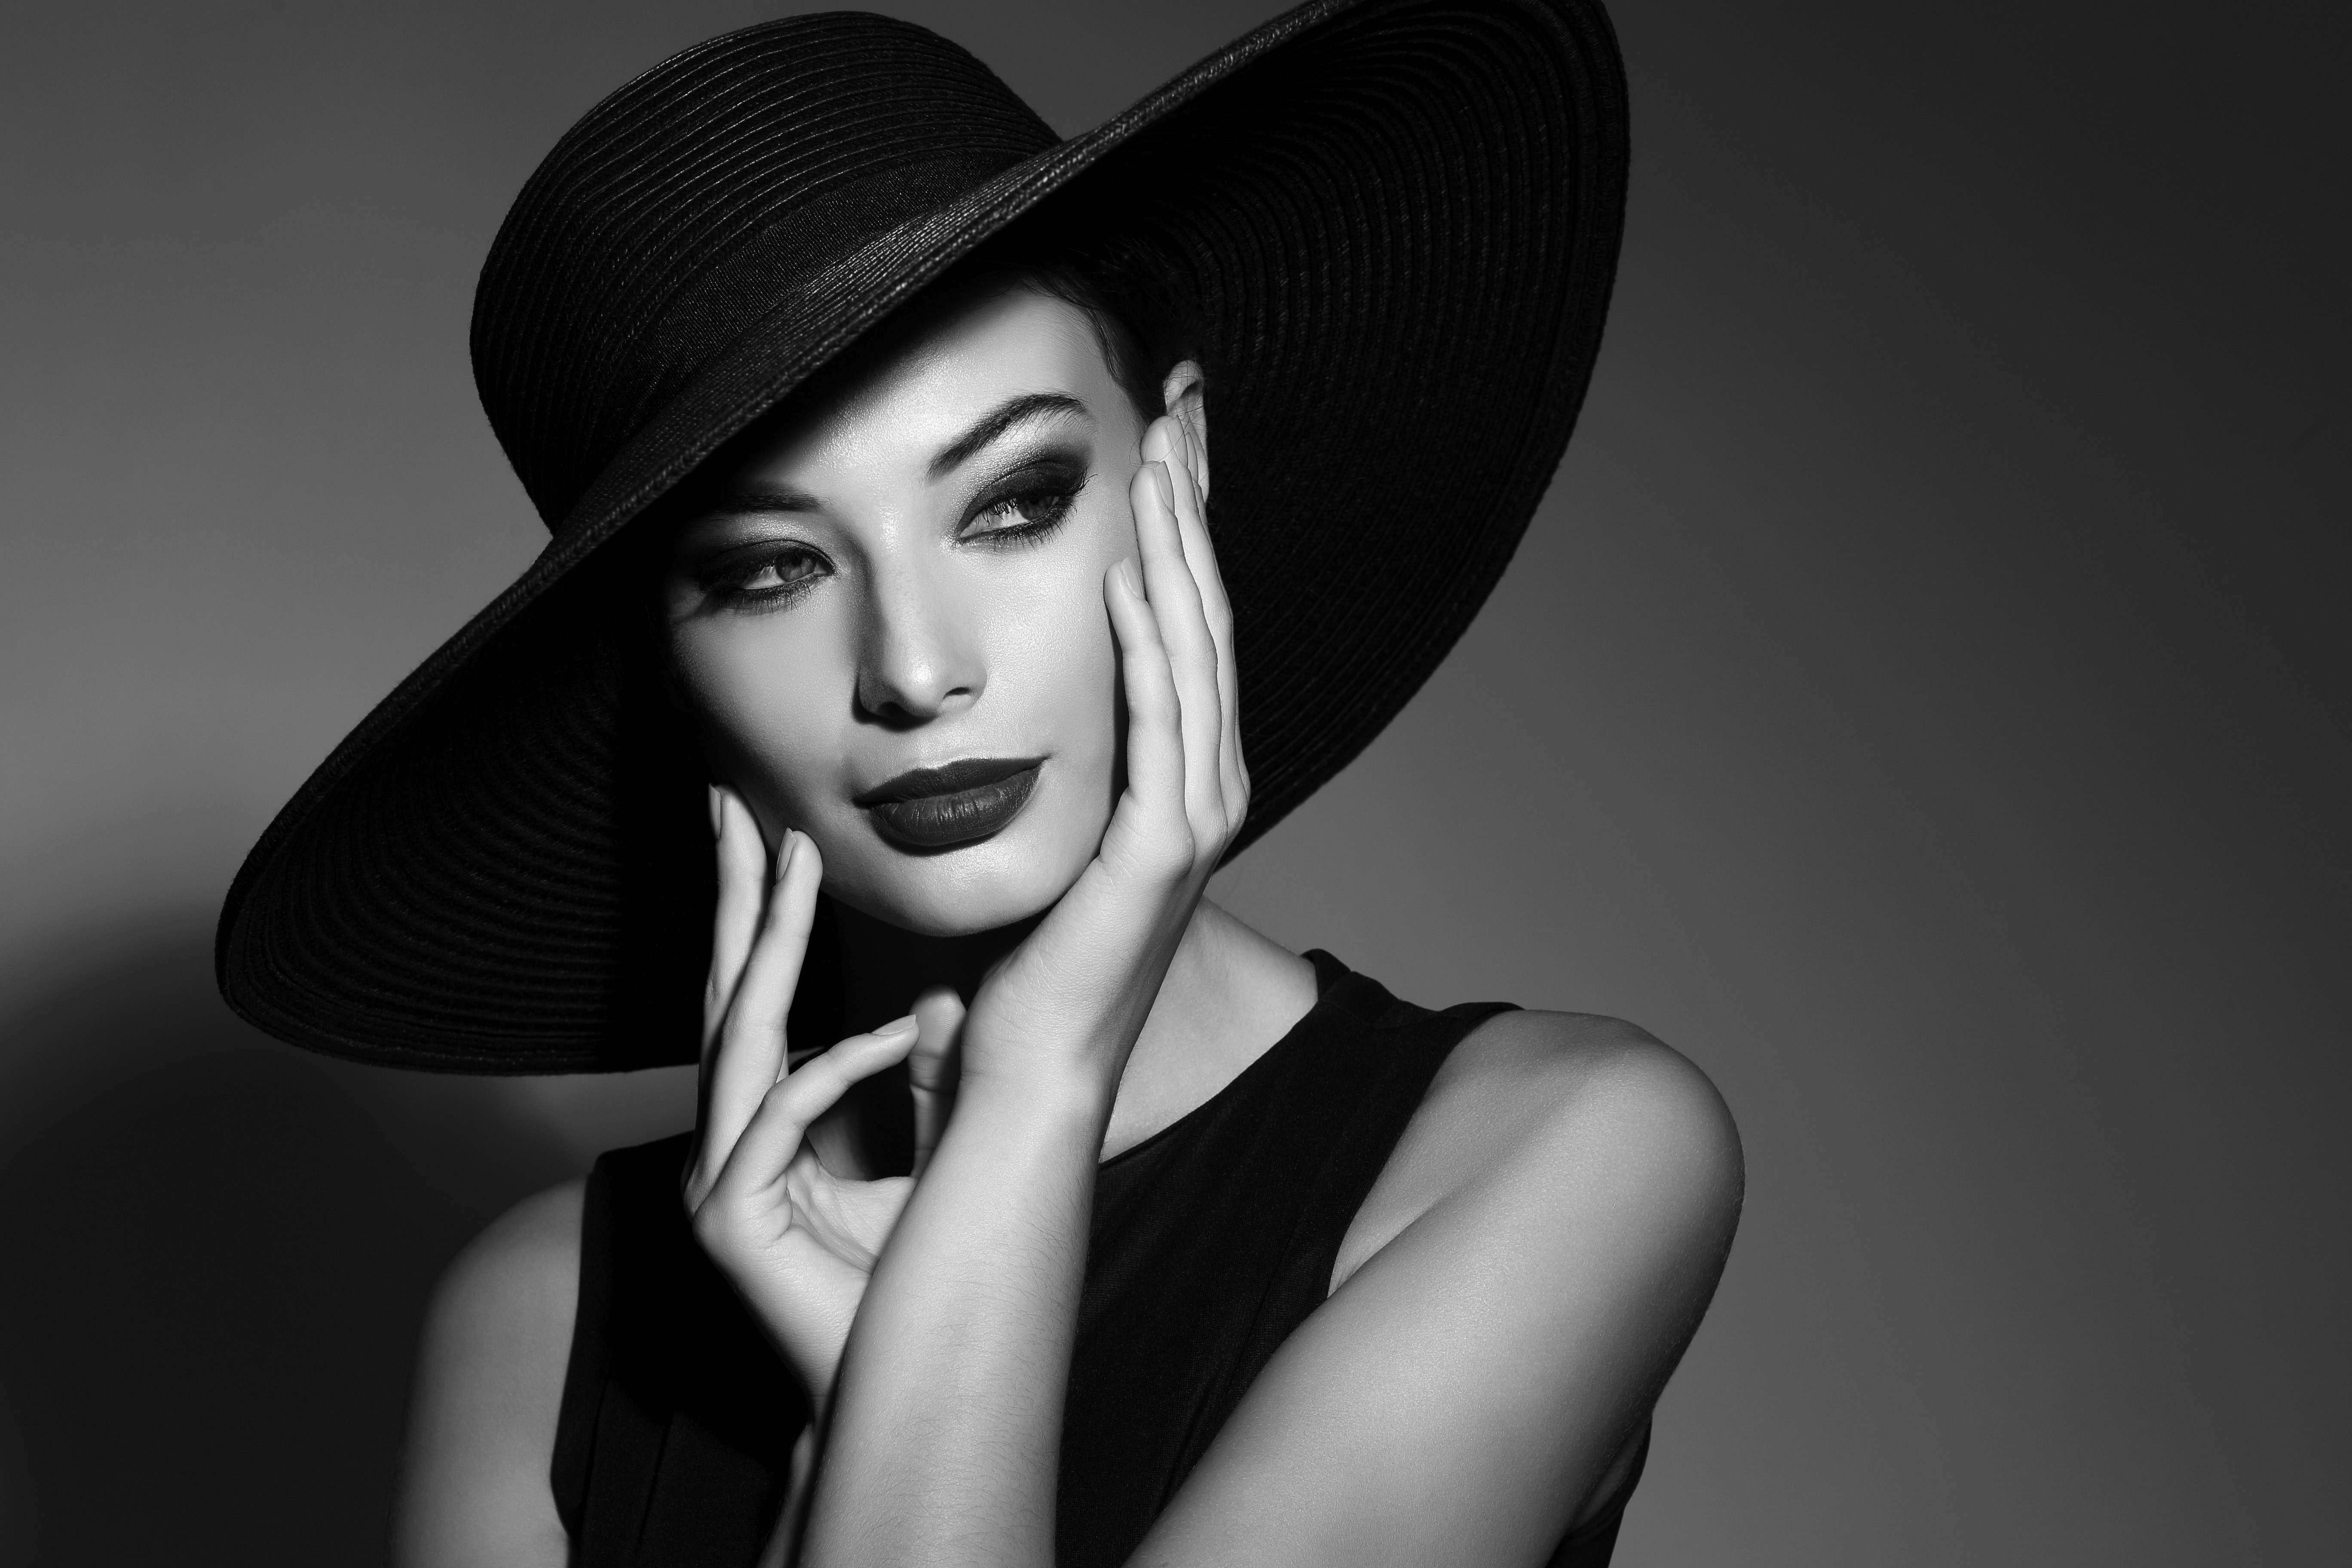 Девушки в шляпах картинки черно белые